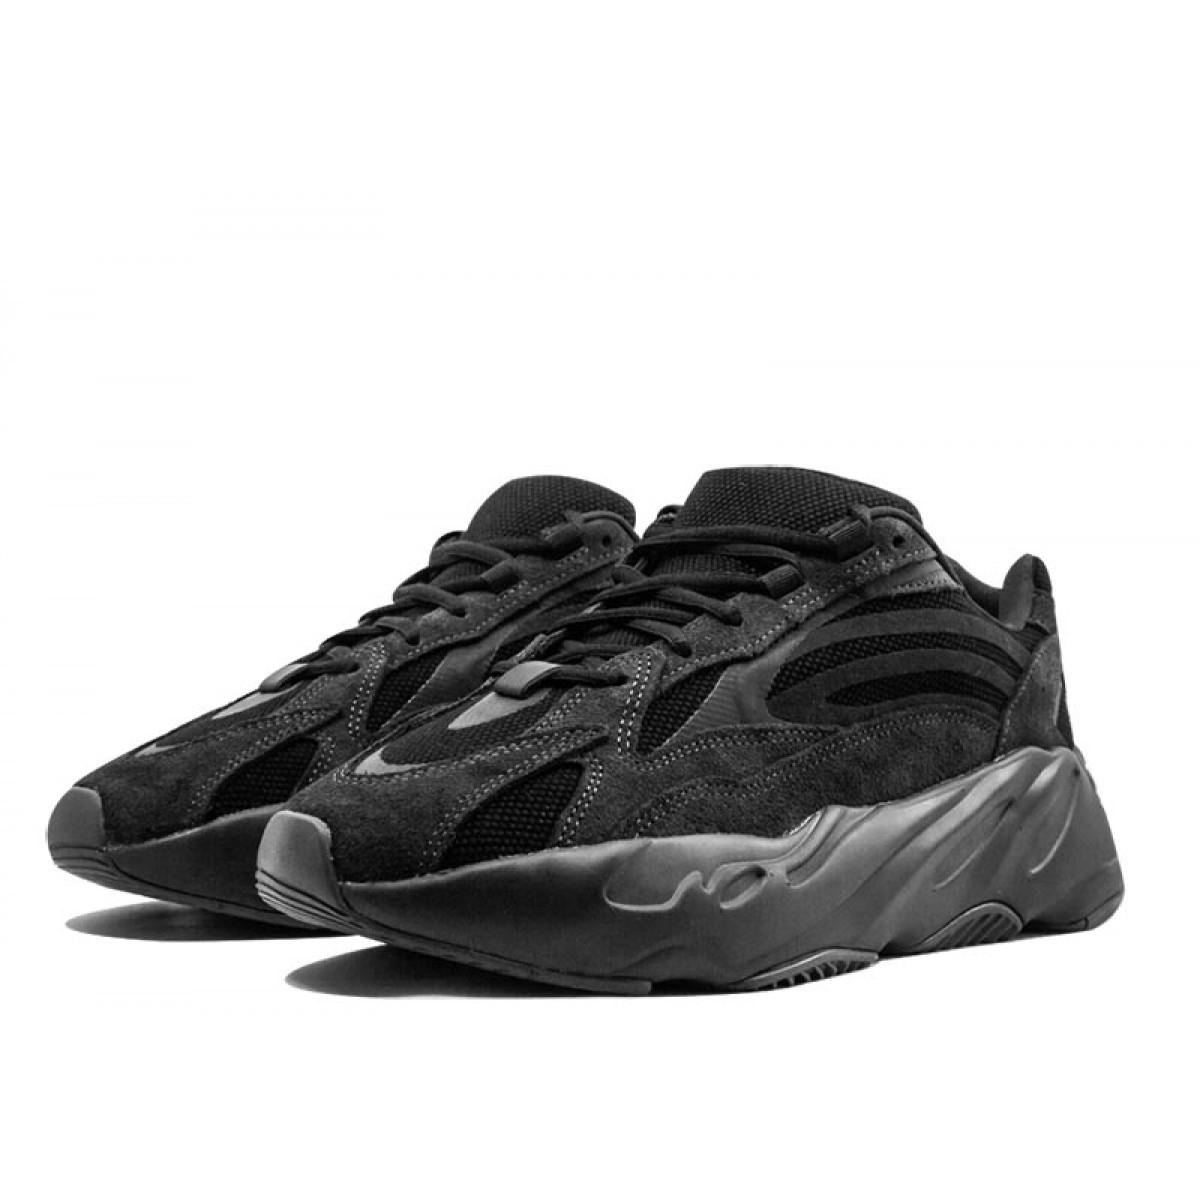 1[TellCathy]Adidas Yeezy 700 V2 黑魂 FU6684